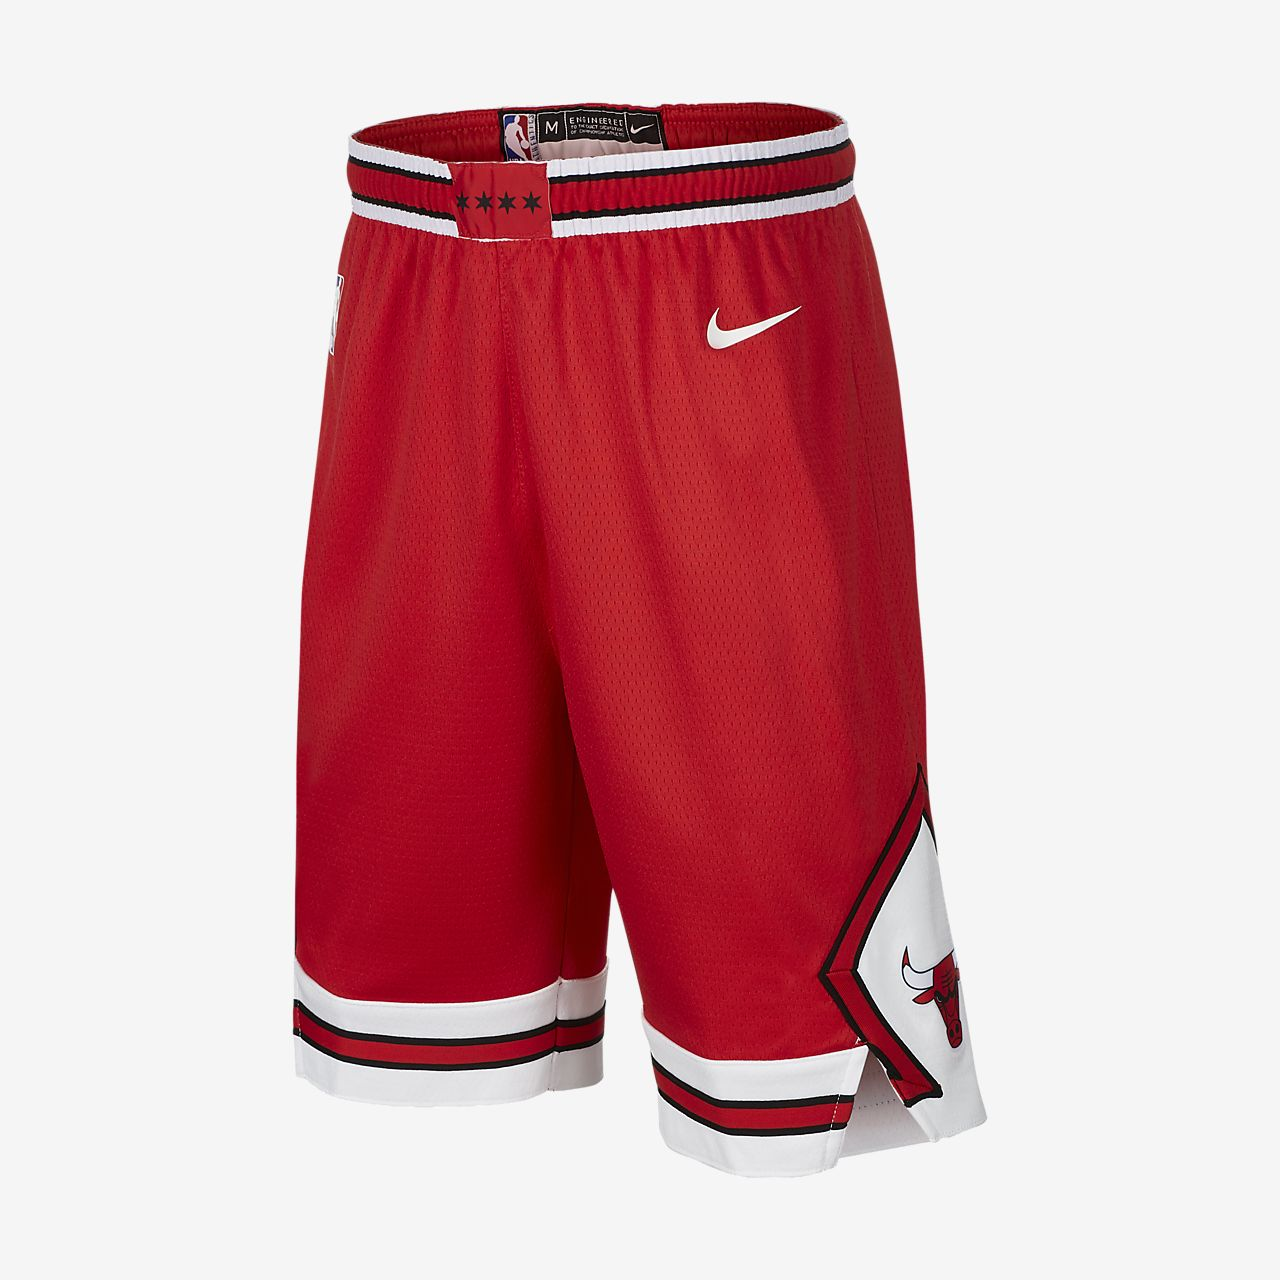 芝加哥公牛队 Nike Icon Edition Swingman 大童(男孩)NBA 短裤